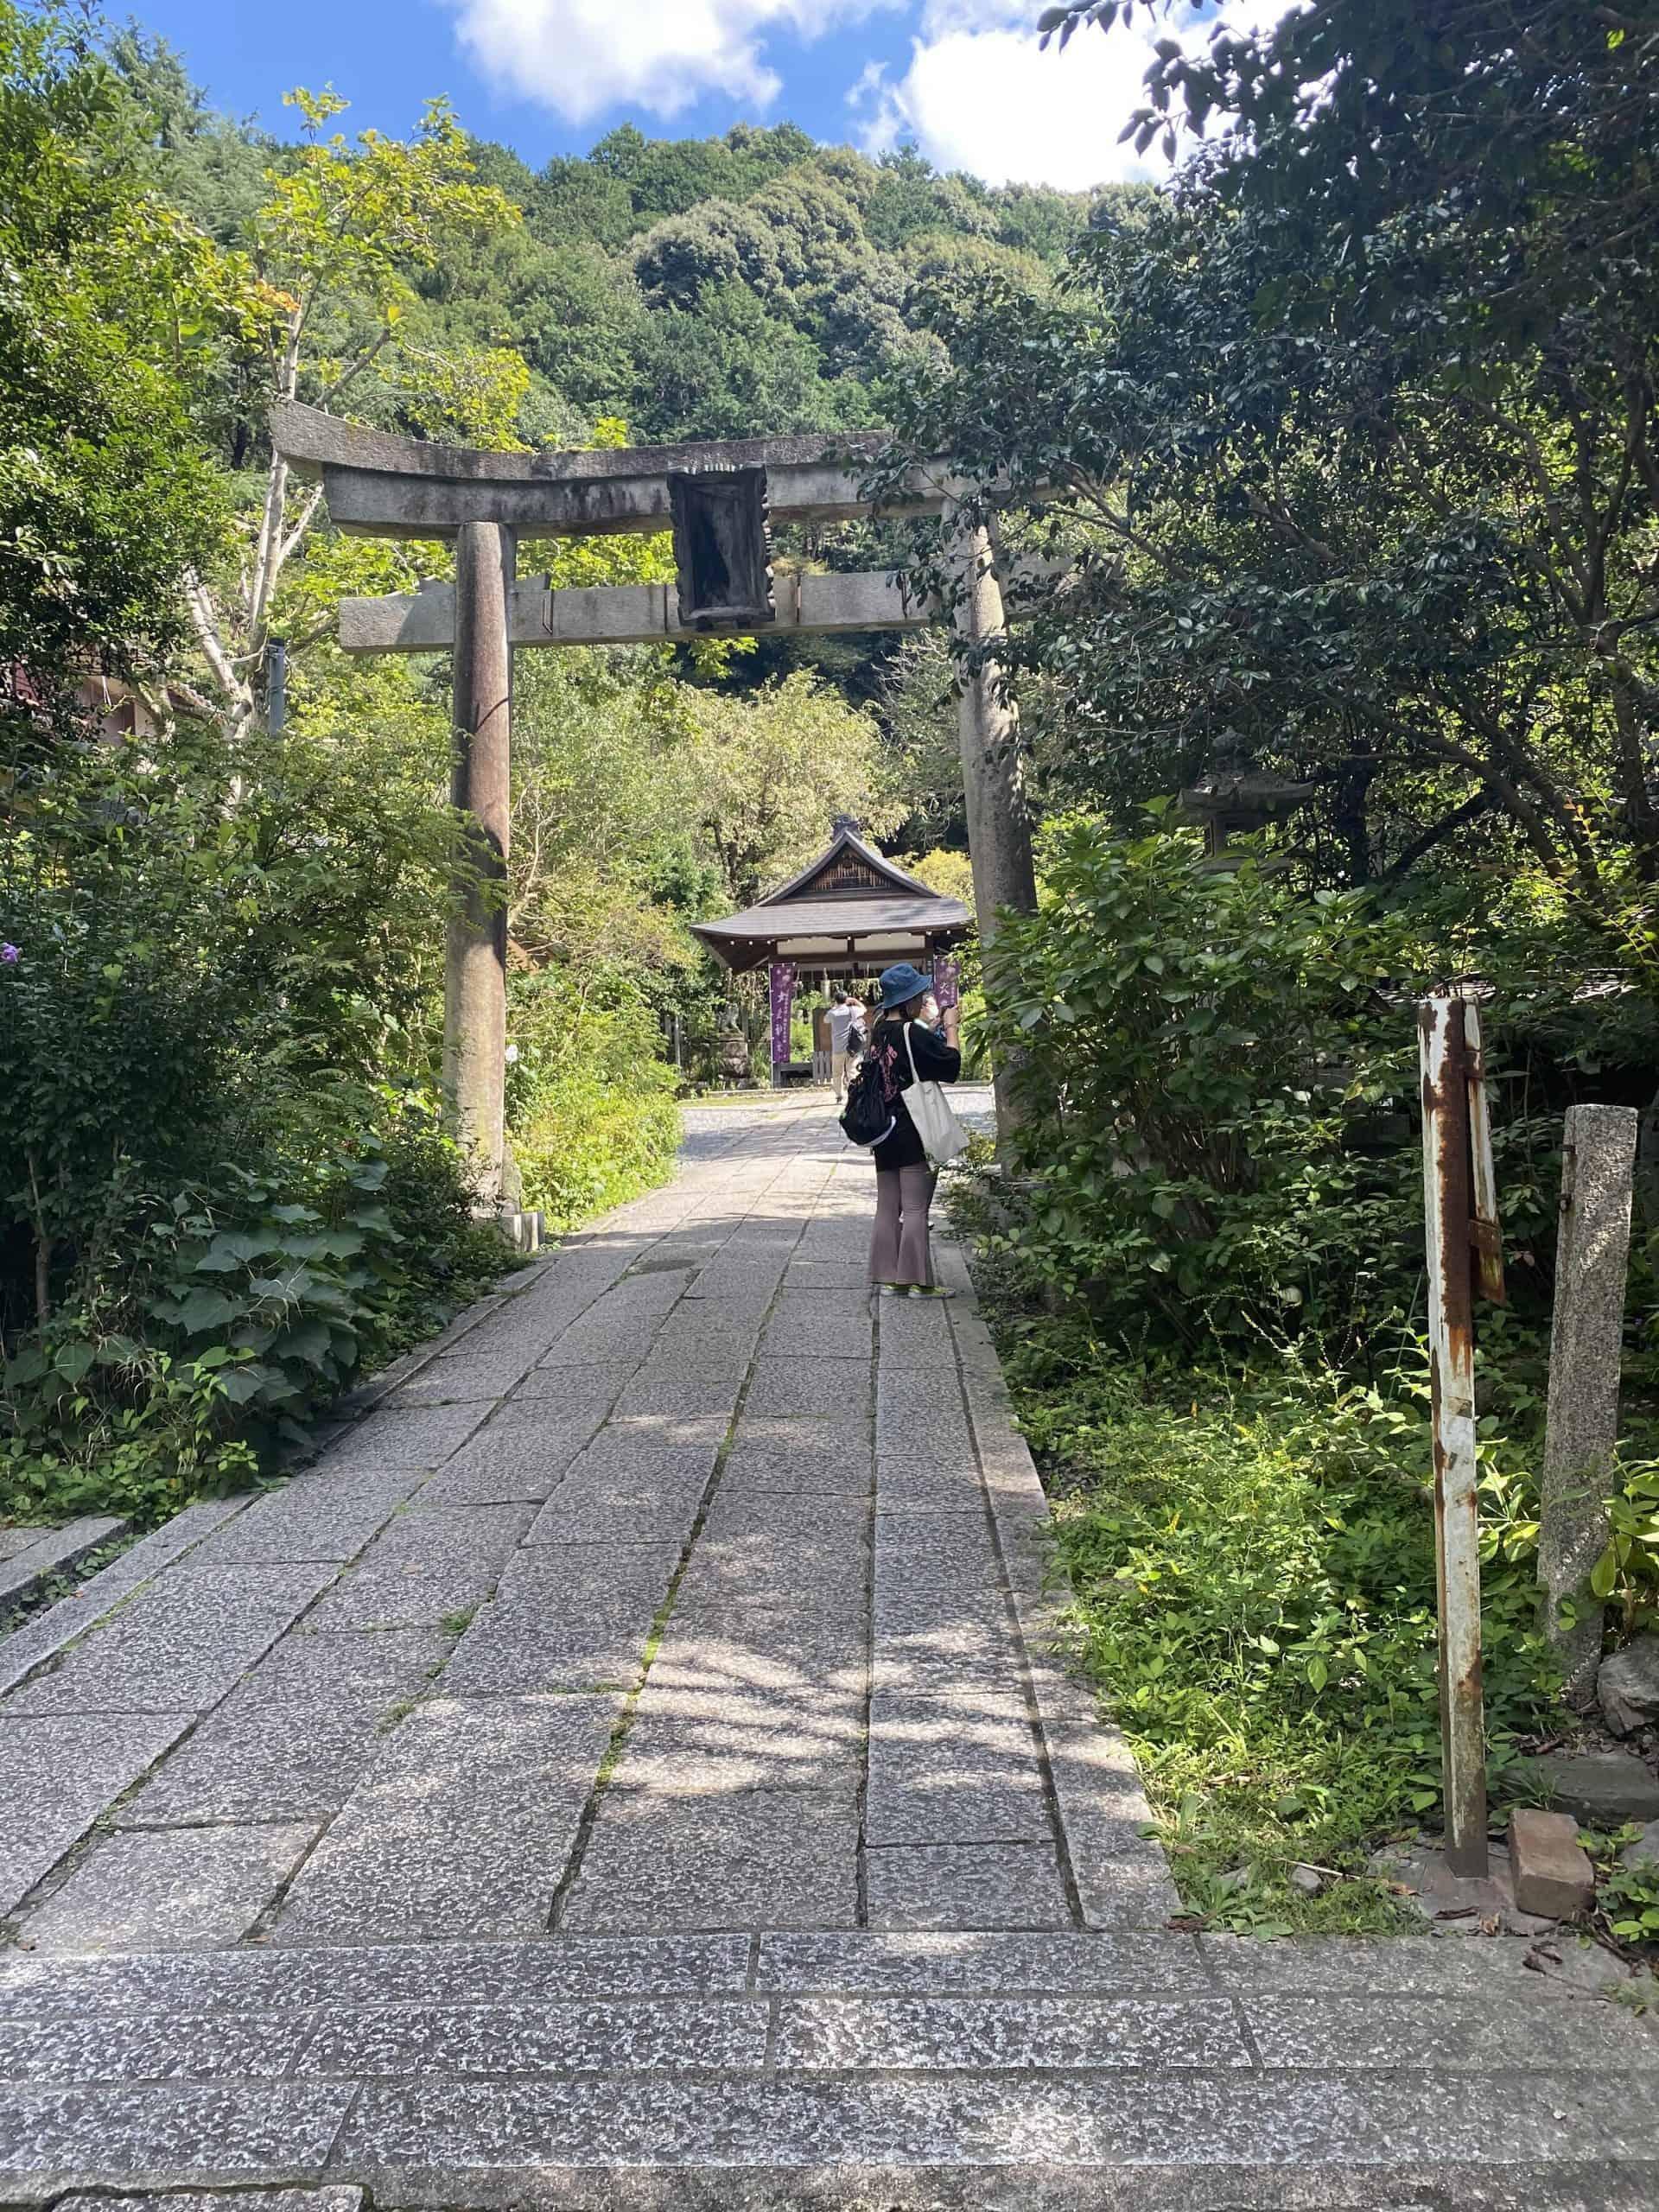 kyoto_essential_Philosopherspath_Point9_OTOYOGATE_1